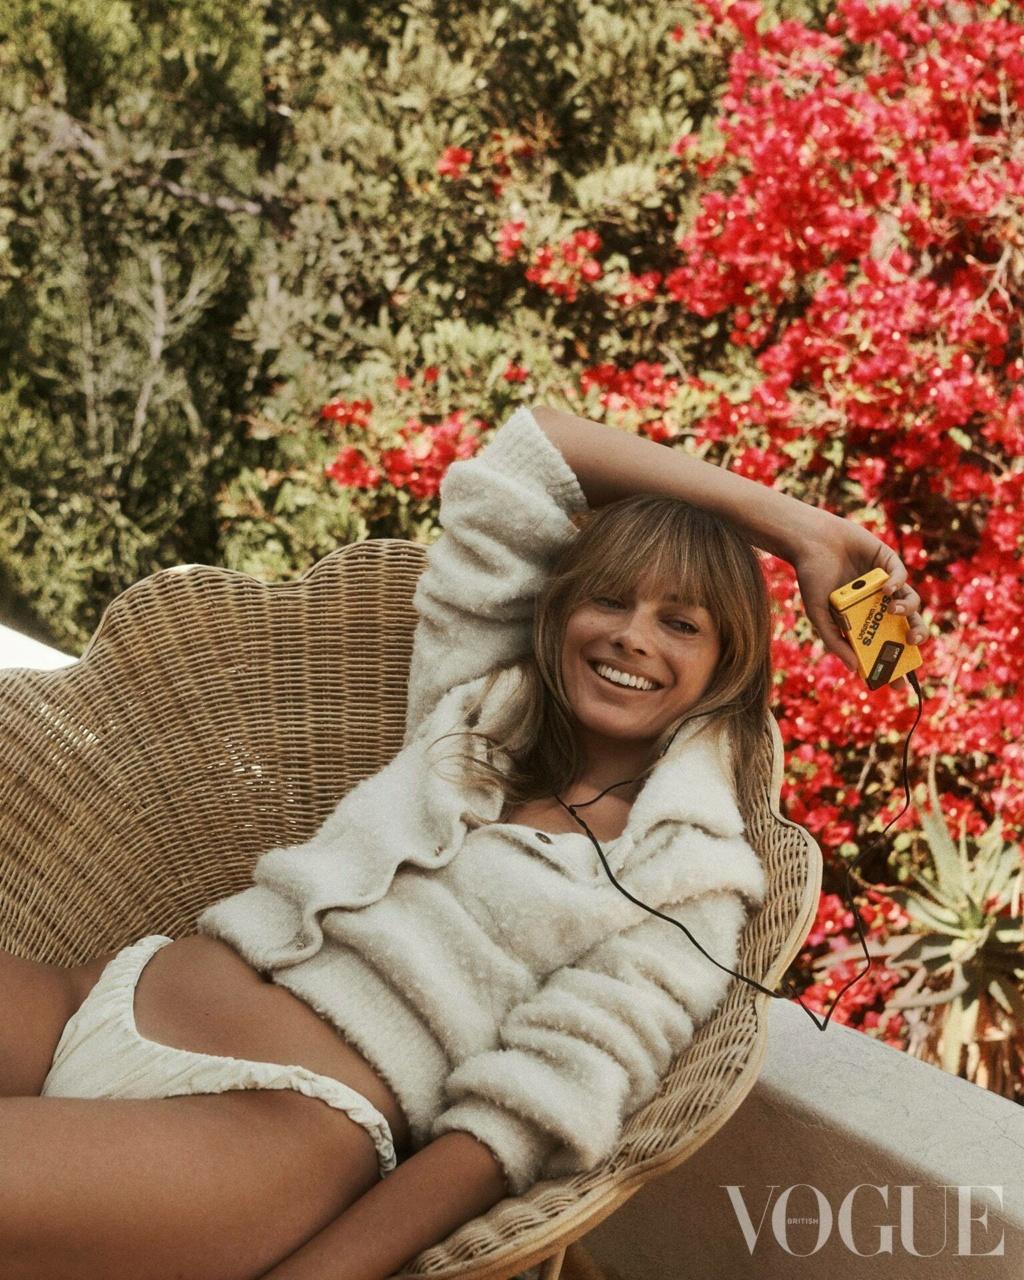 Margot Robbie - Página 2 Me1gm711